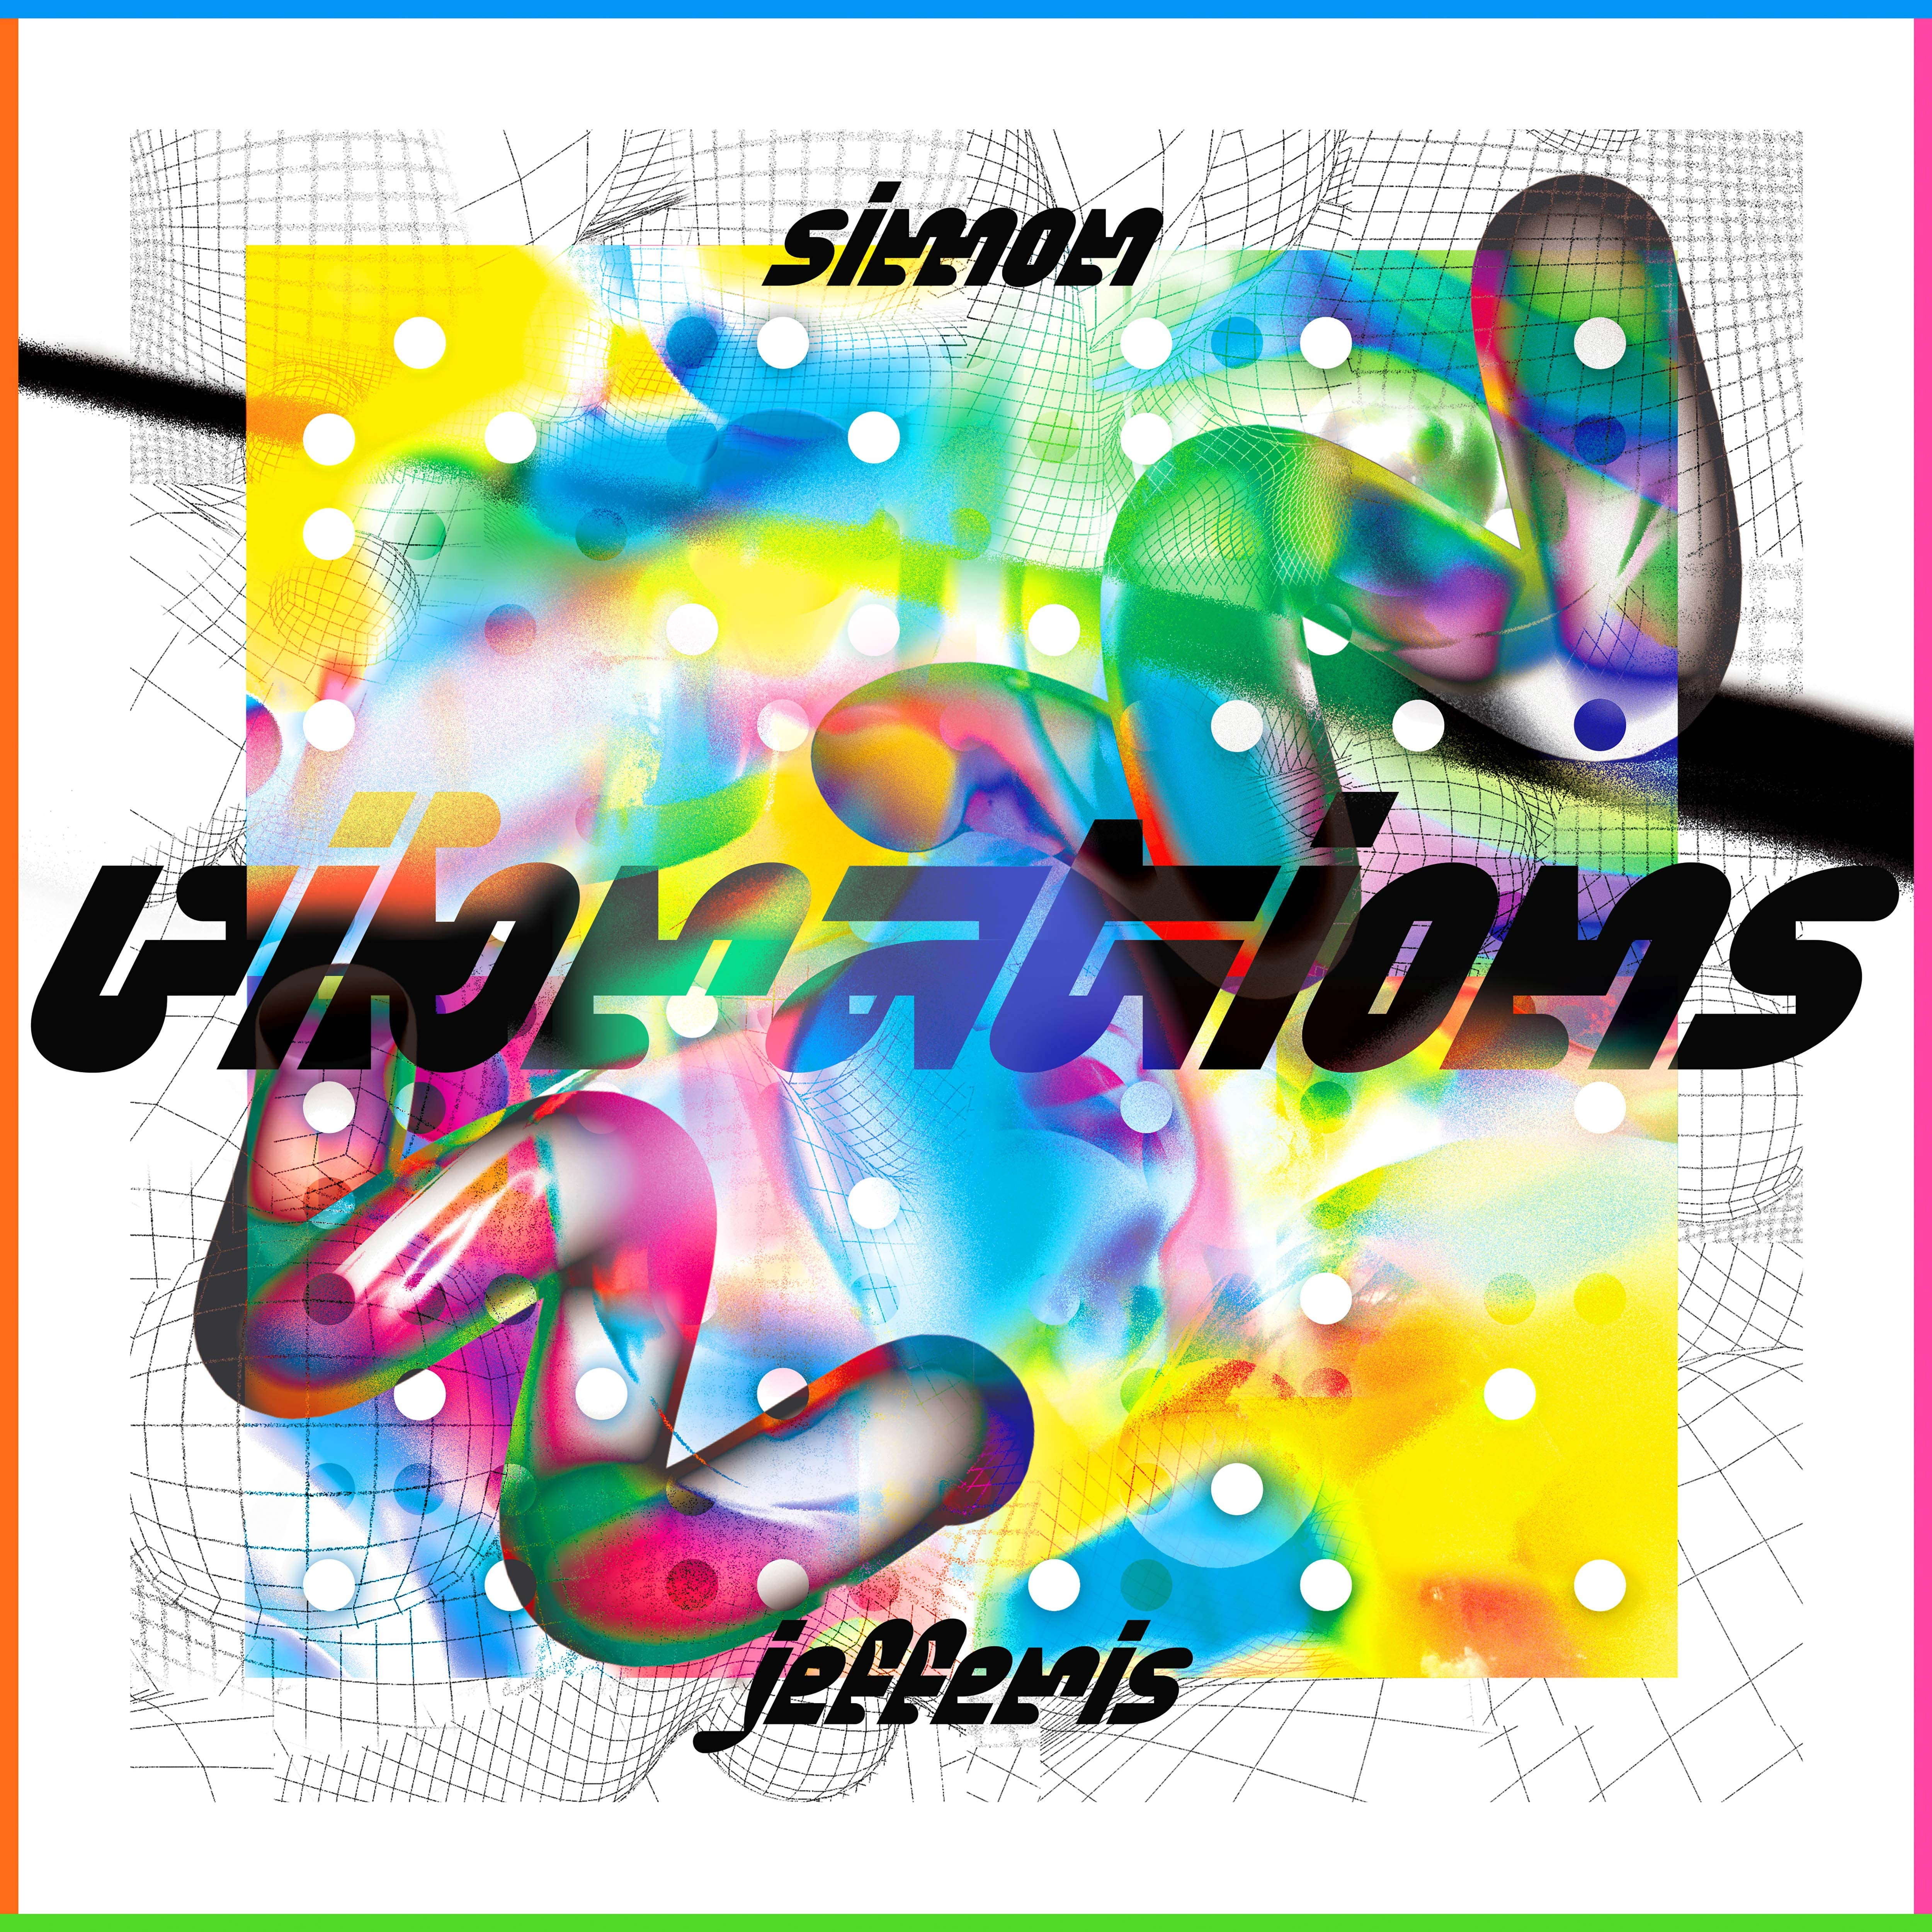 Simon Jefferis - Vibrations